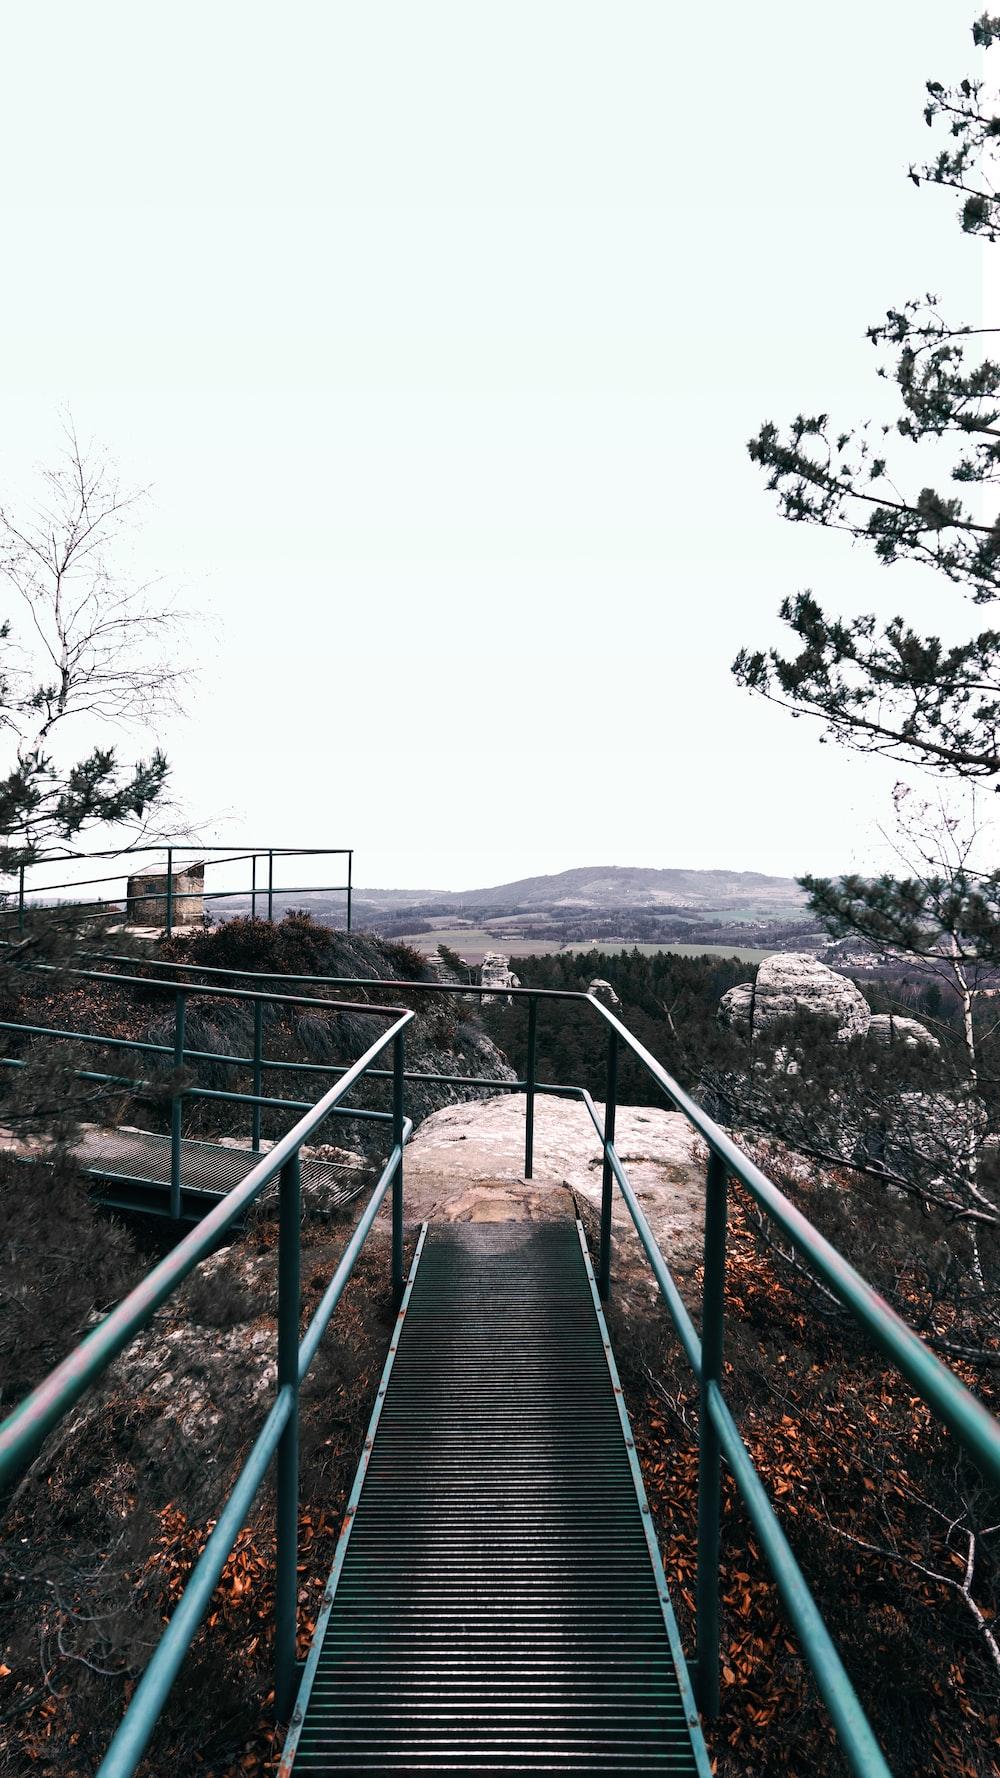 black metal railings on brown rocky mountain during daytime